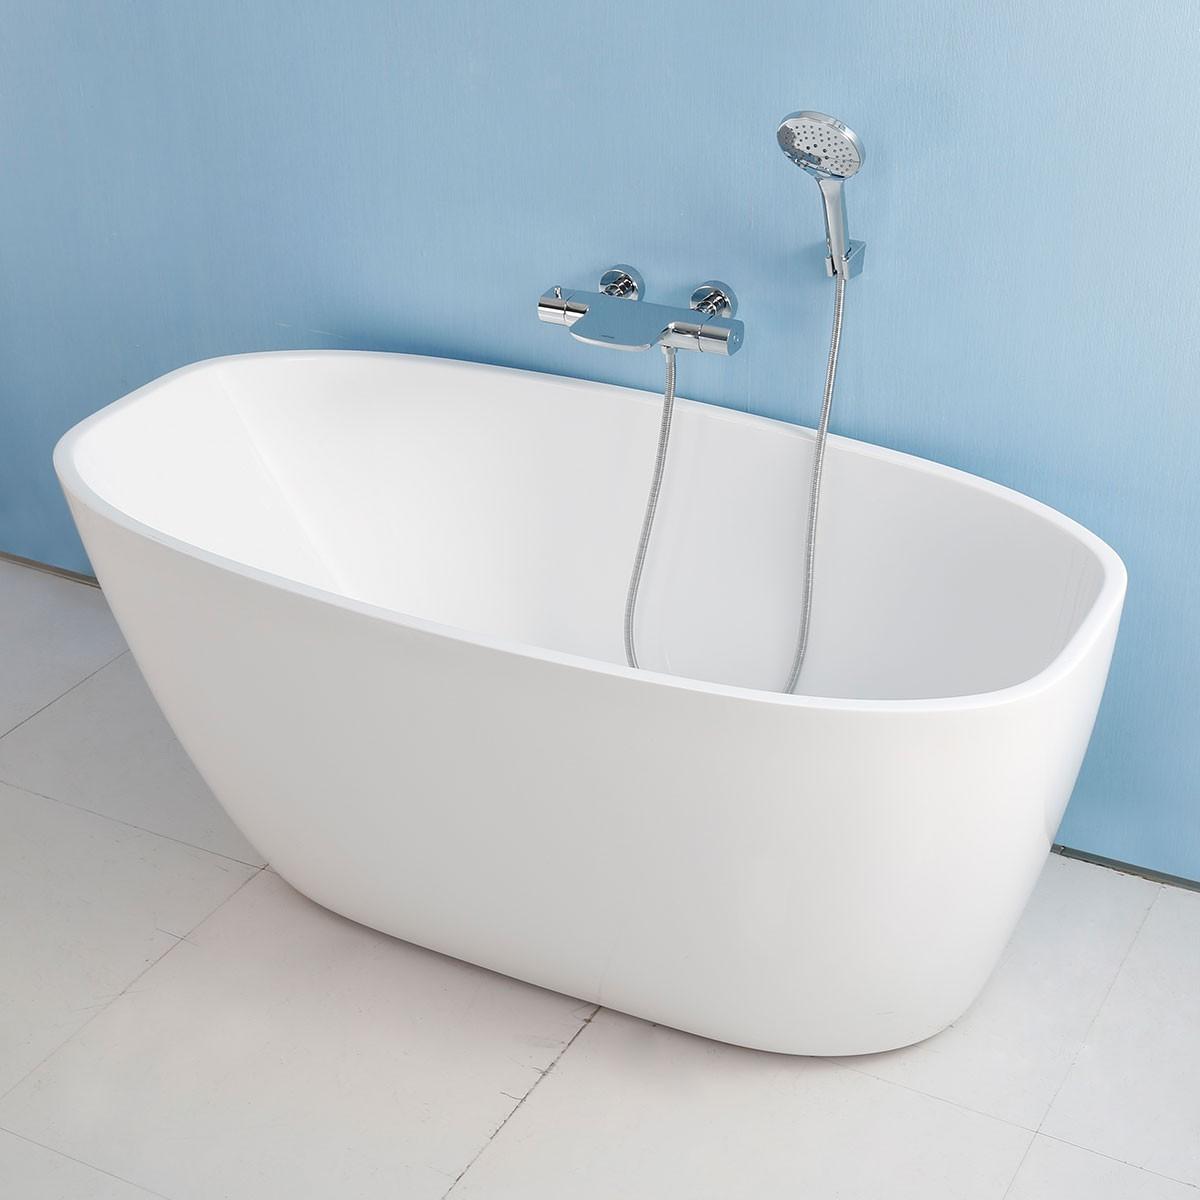 67 In Seamless Acrylic Freestanding Bathtub (DK-AT-15776W ...